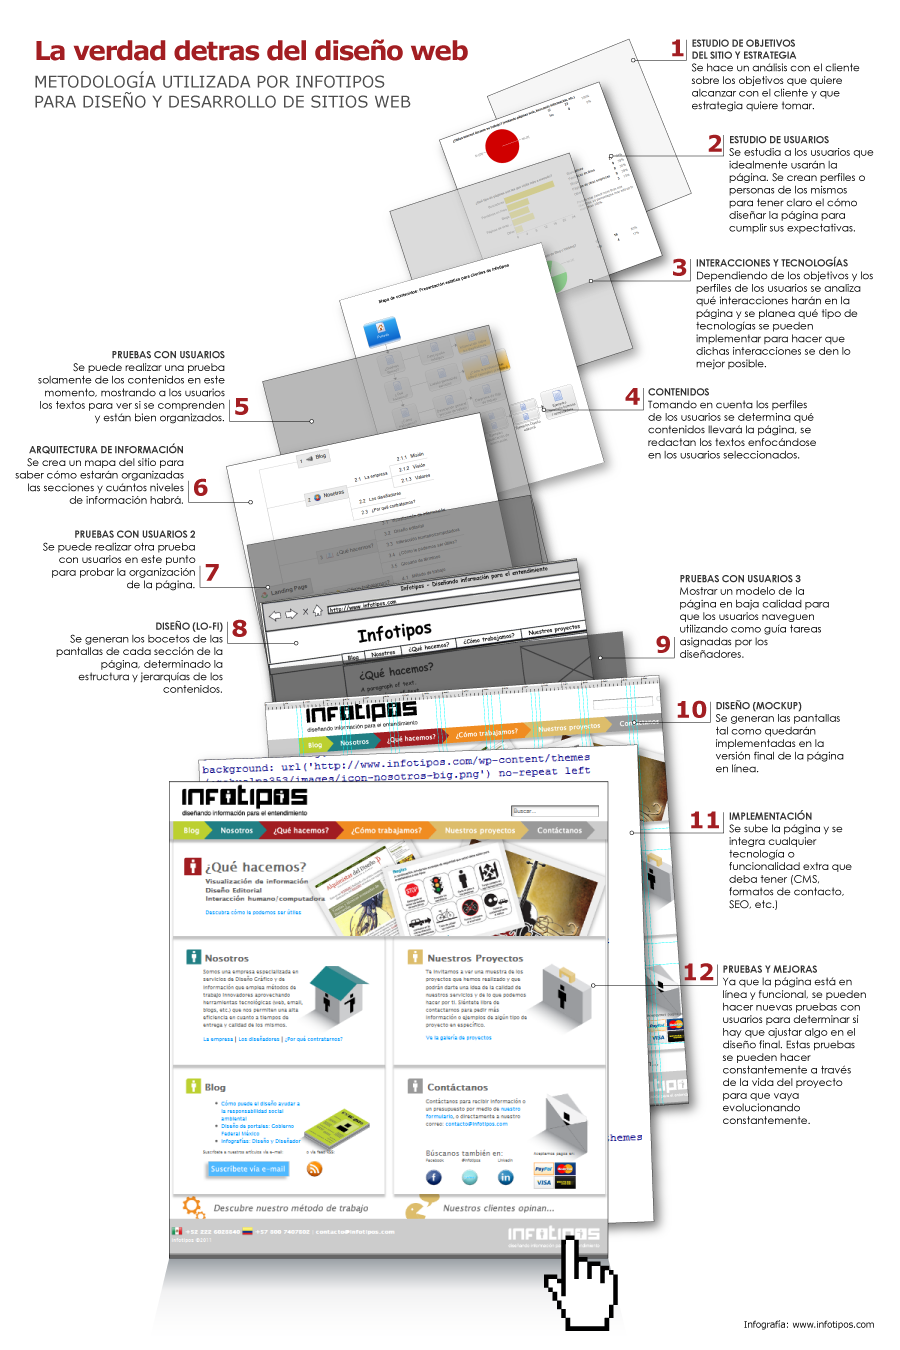 Infograf a dise o de p ginas web - Paginas de arquitectura y diseno ...